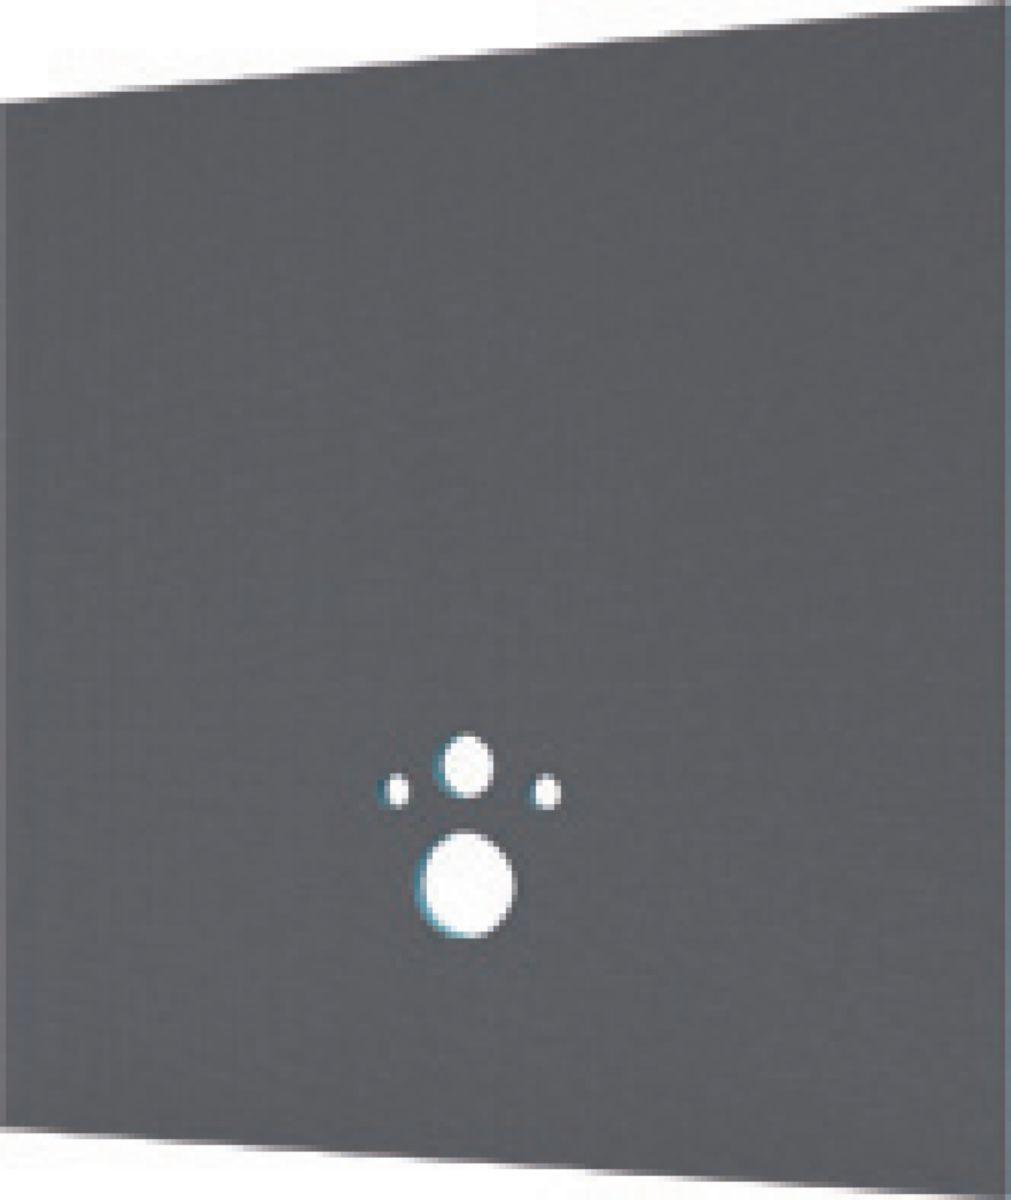 Modele Salle De Bain Simple ~ Panneau D Habillage Pour B Ti Support De Wc Polystyr Ne Extrud Wedi